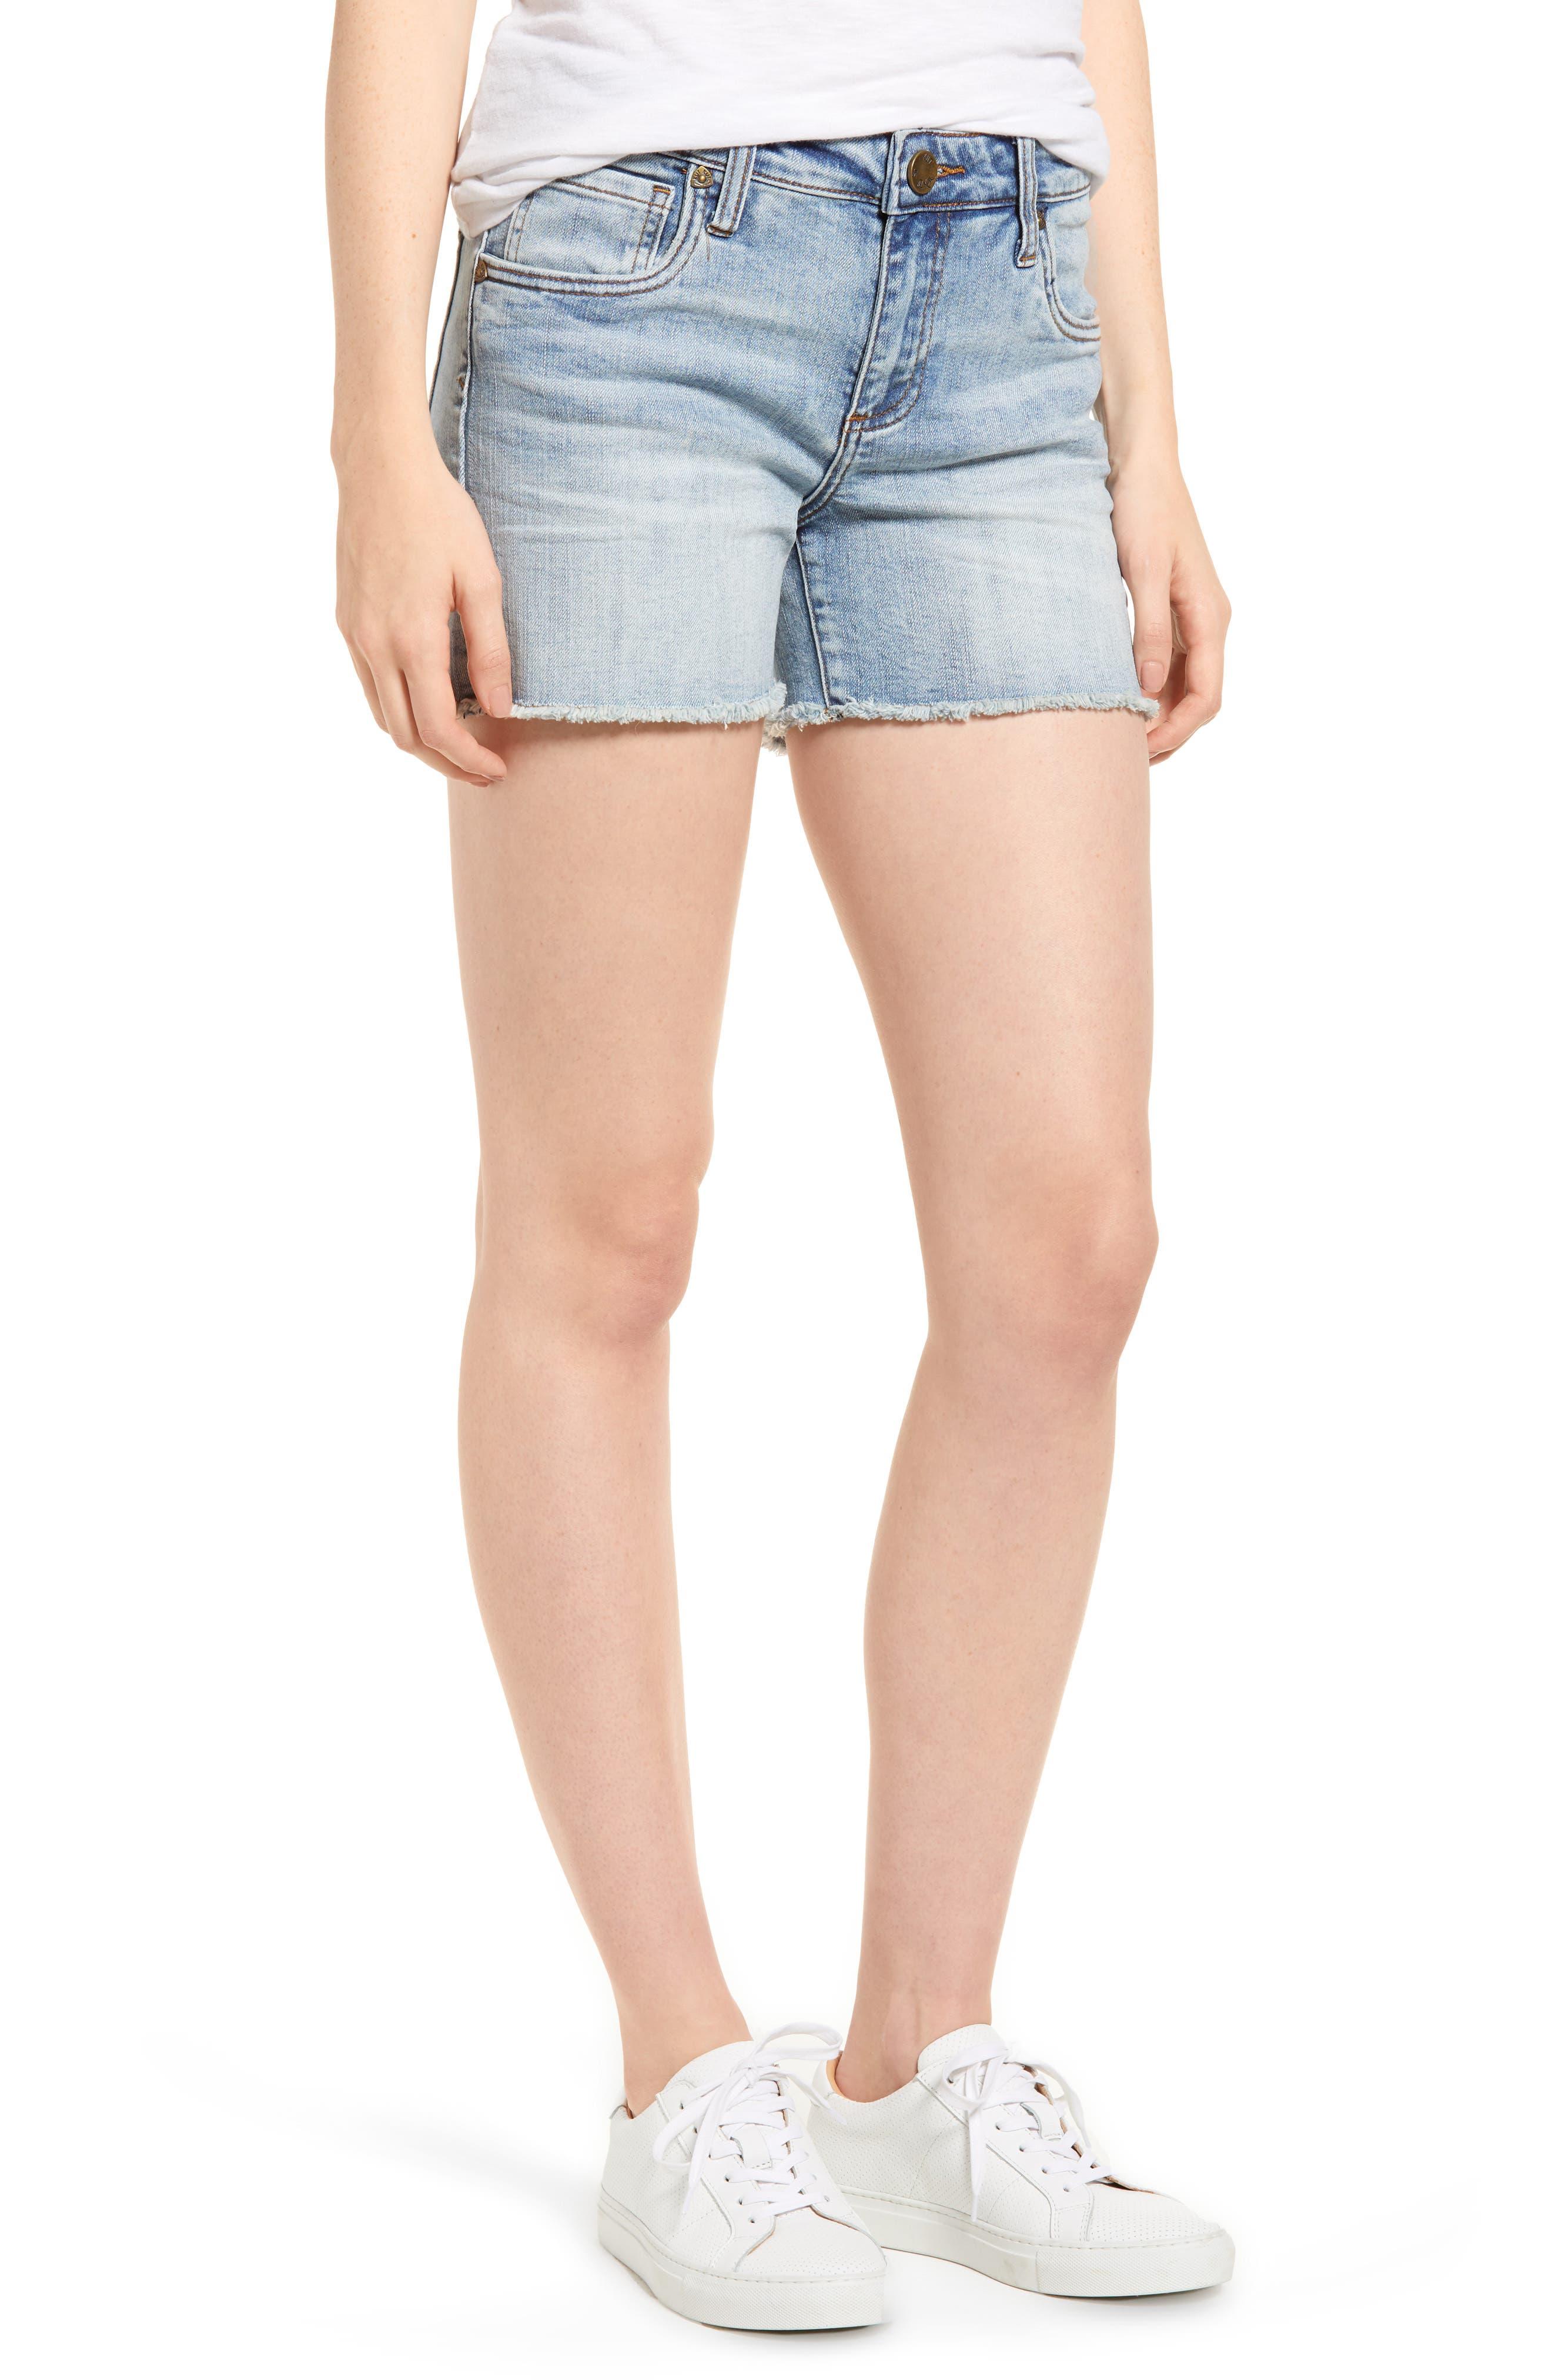 Gidget Cutoff Denim Shorts,                             Main thumbnail 1, color,                             470